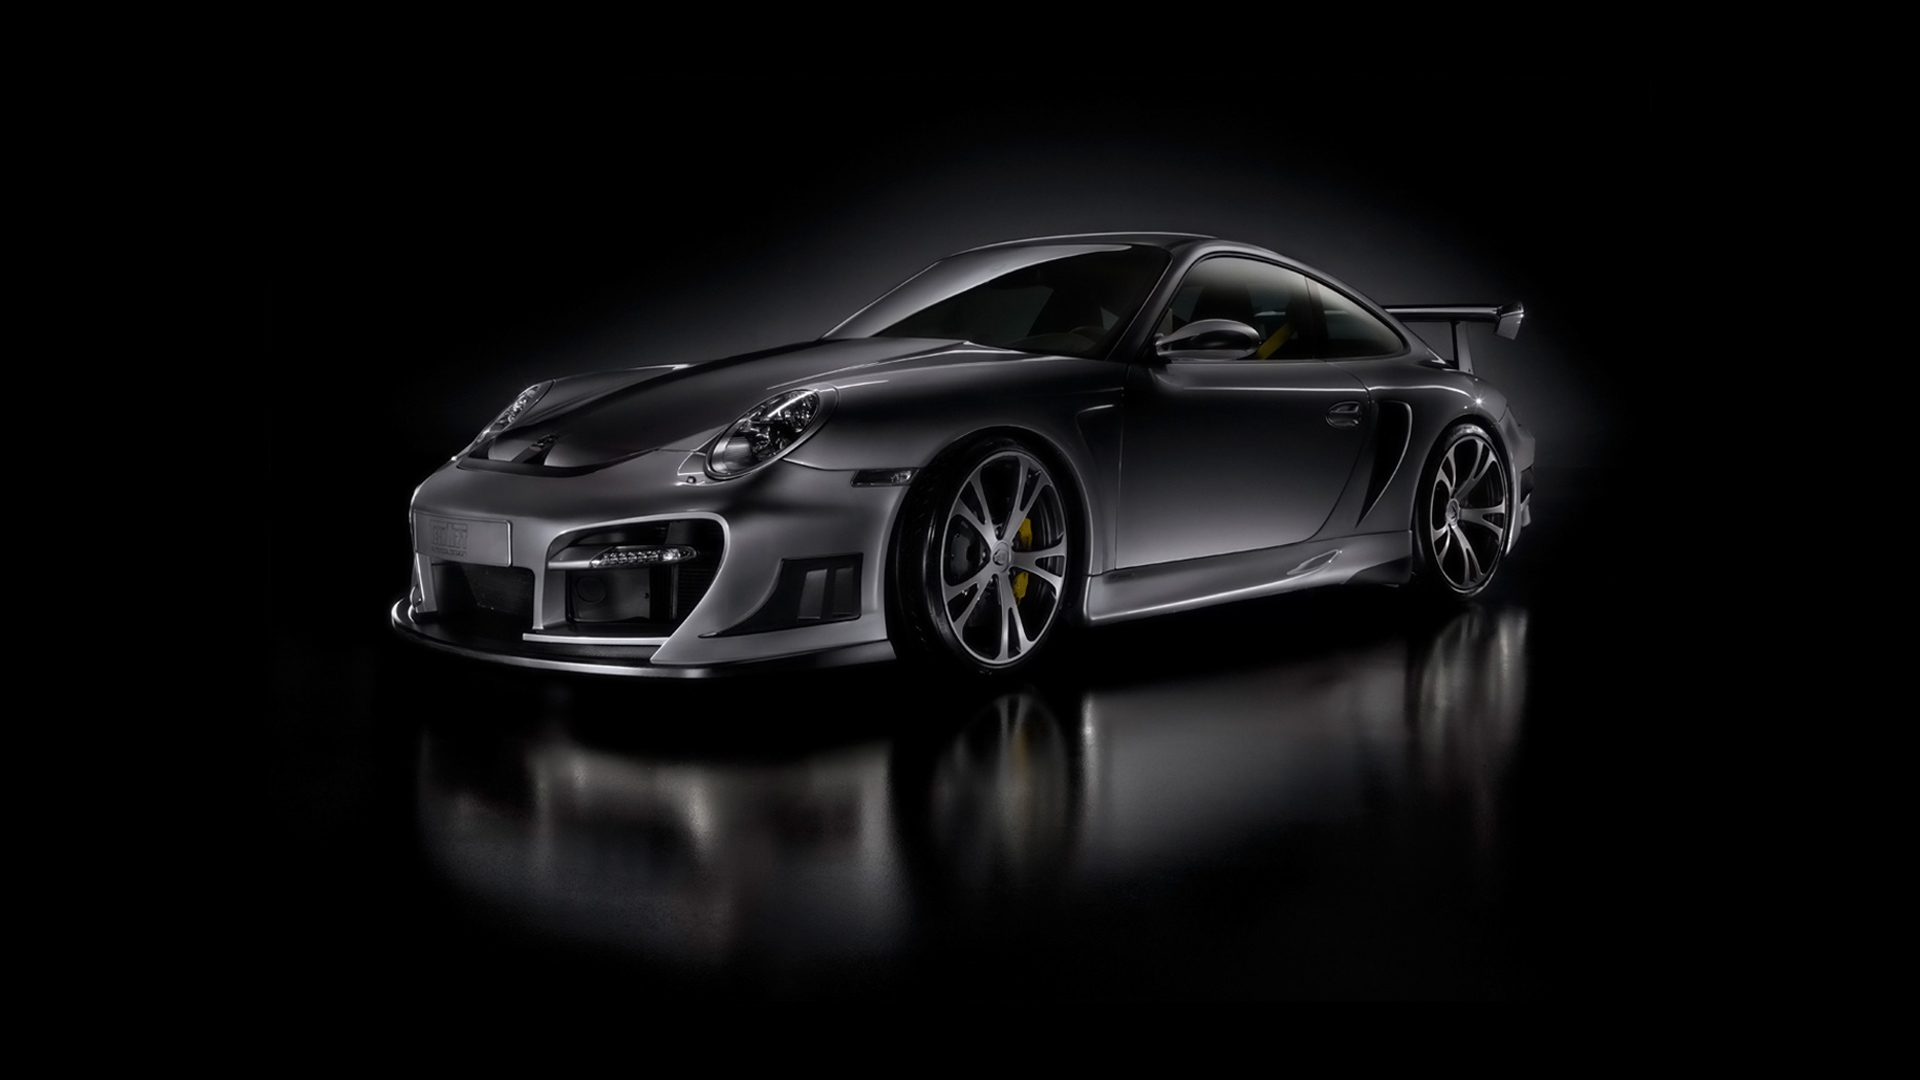 Dark Porsche GT Street Racing HDTV 1080p Wallpapers HD Wallpapers 1920x1080